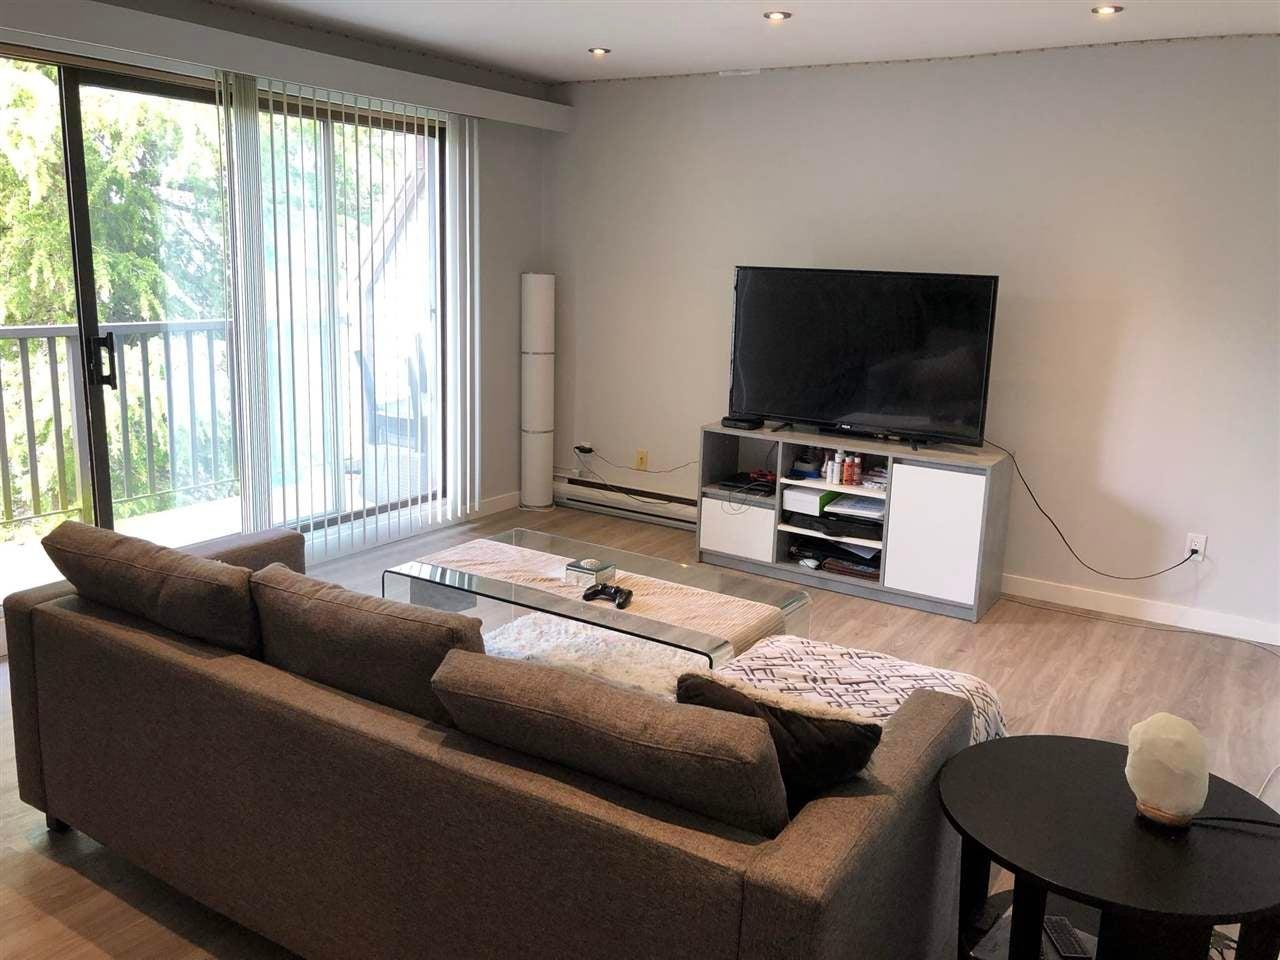 304 15238 100 AVENUE - Guildford Apartment/Condo for sale, 1 Bedroom (R2576105) - #2